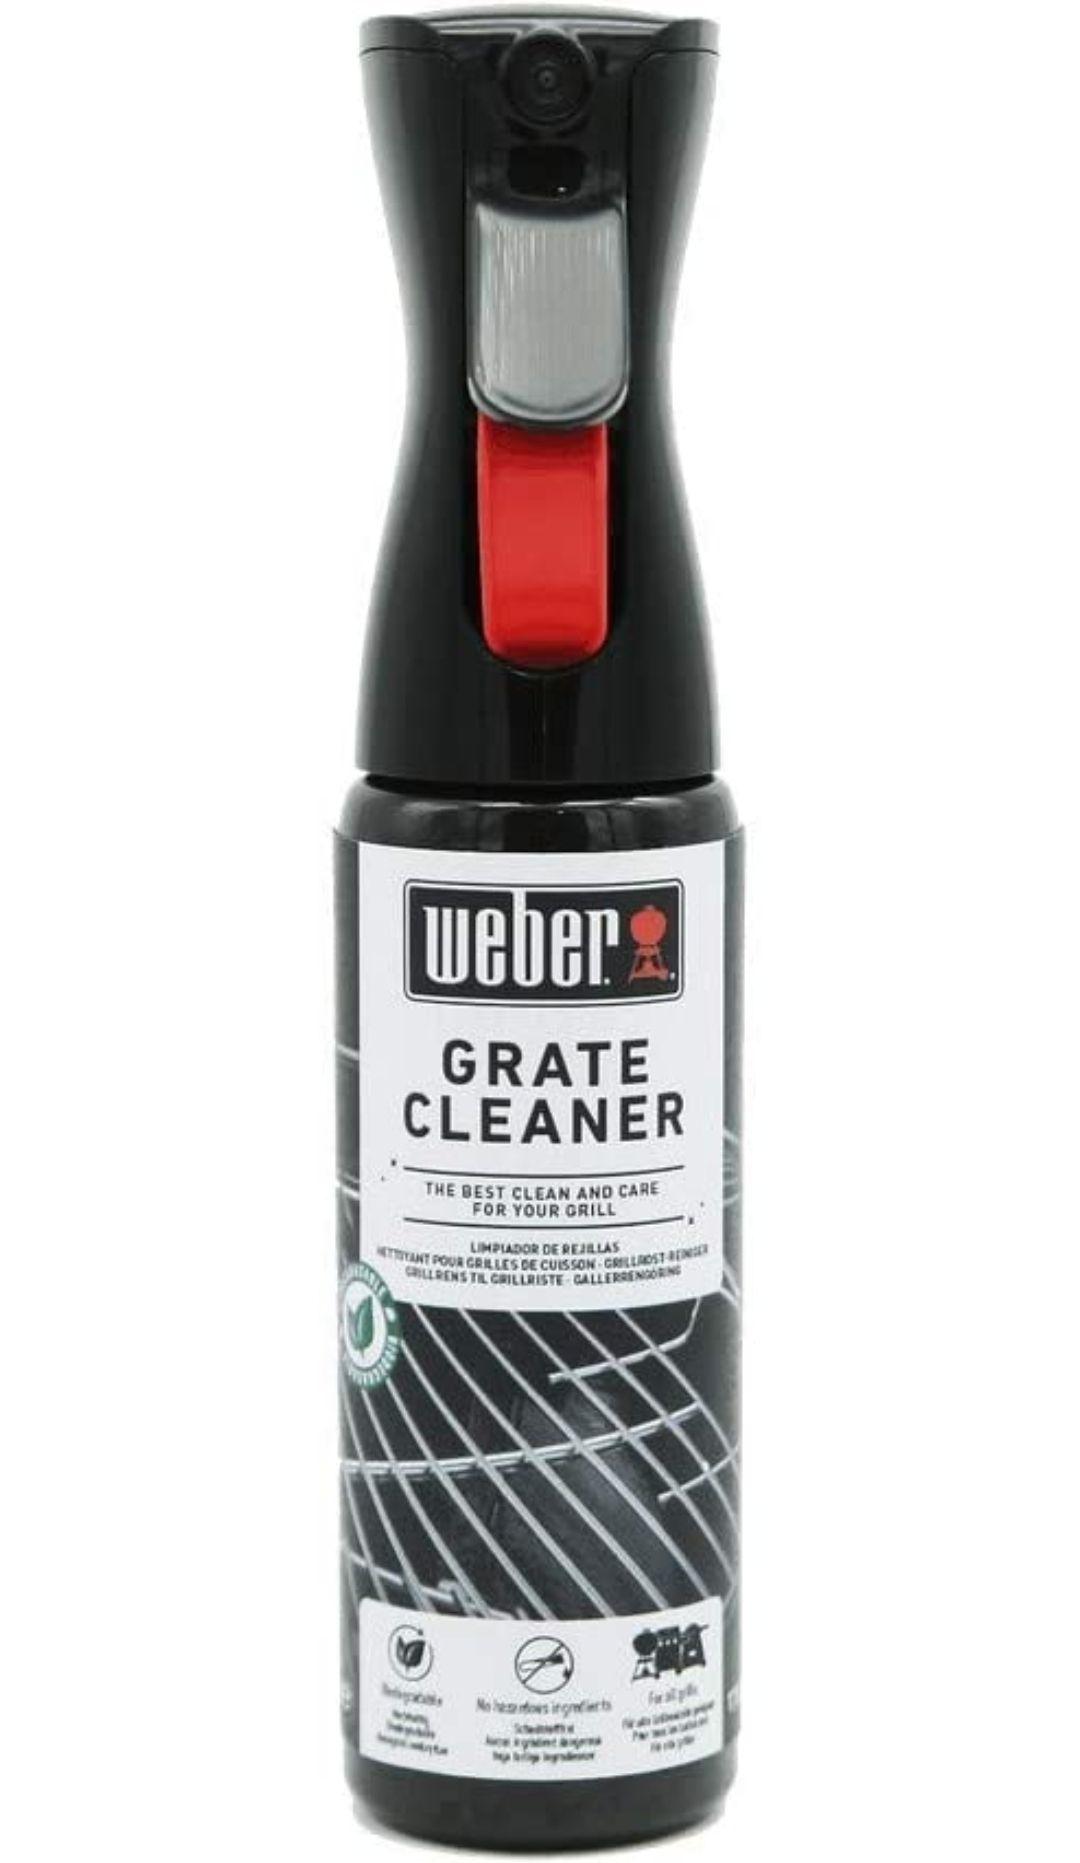 Weber 17875 Grate Cleaner, Black, 5.0 cm*25.0 cm*8.0 cm £7.97 Amazon Prime (+£4.49 Non Prime)